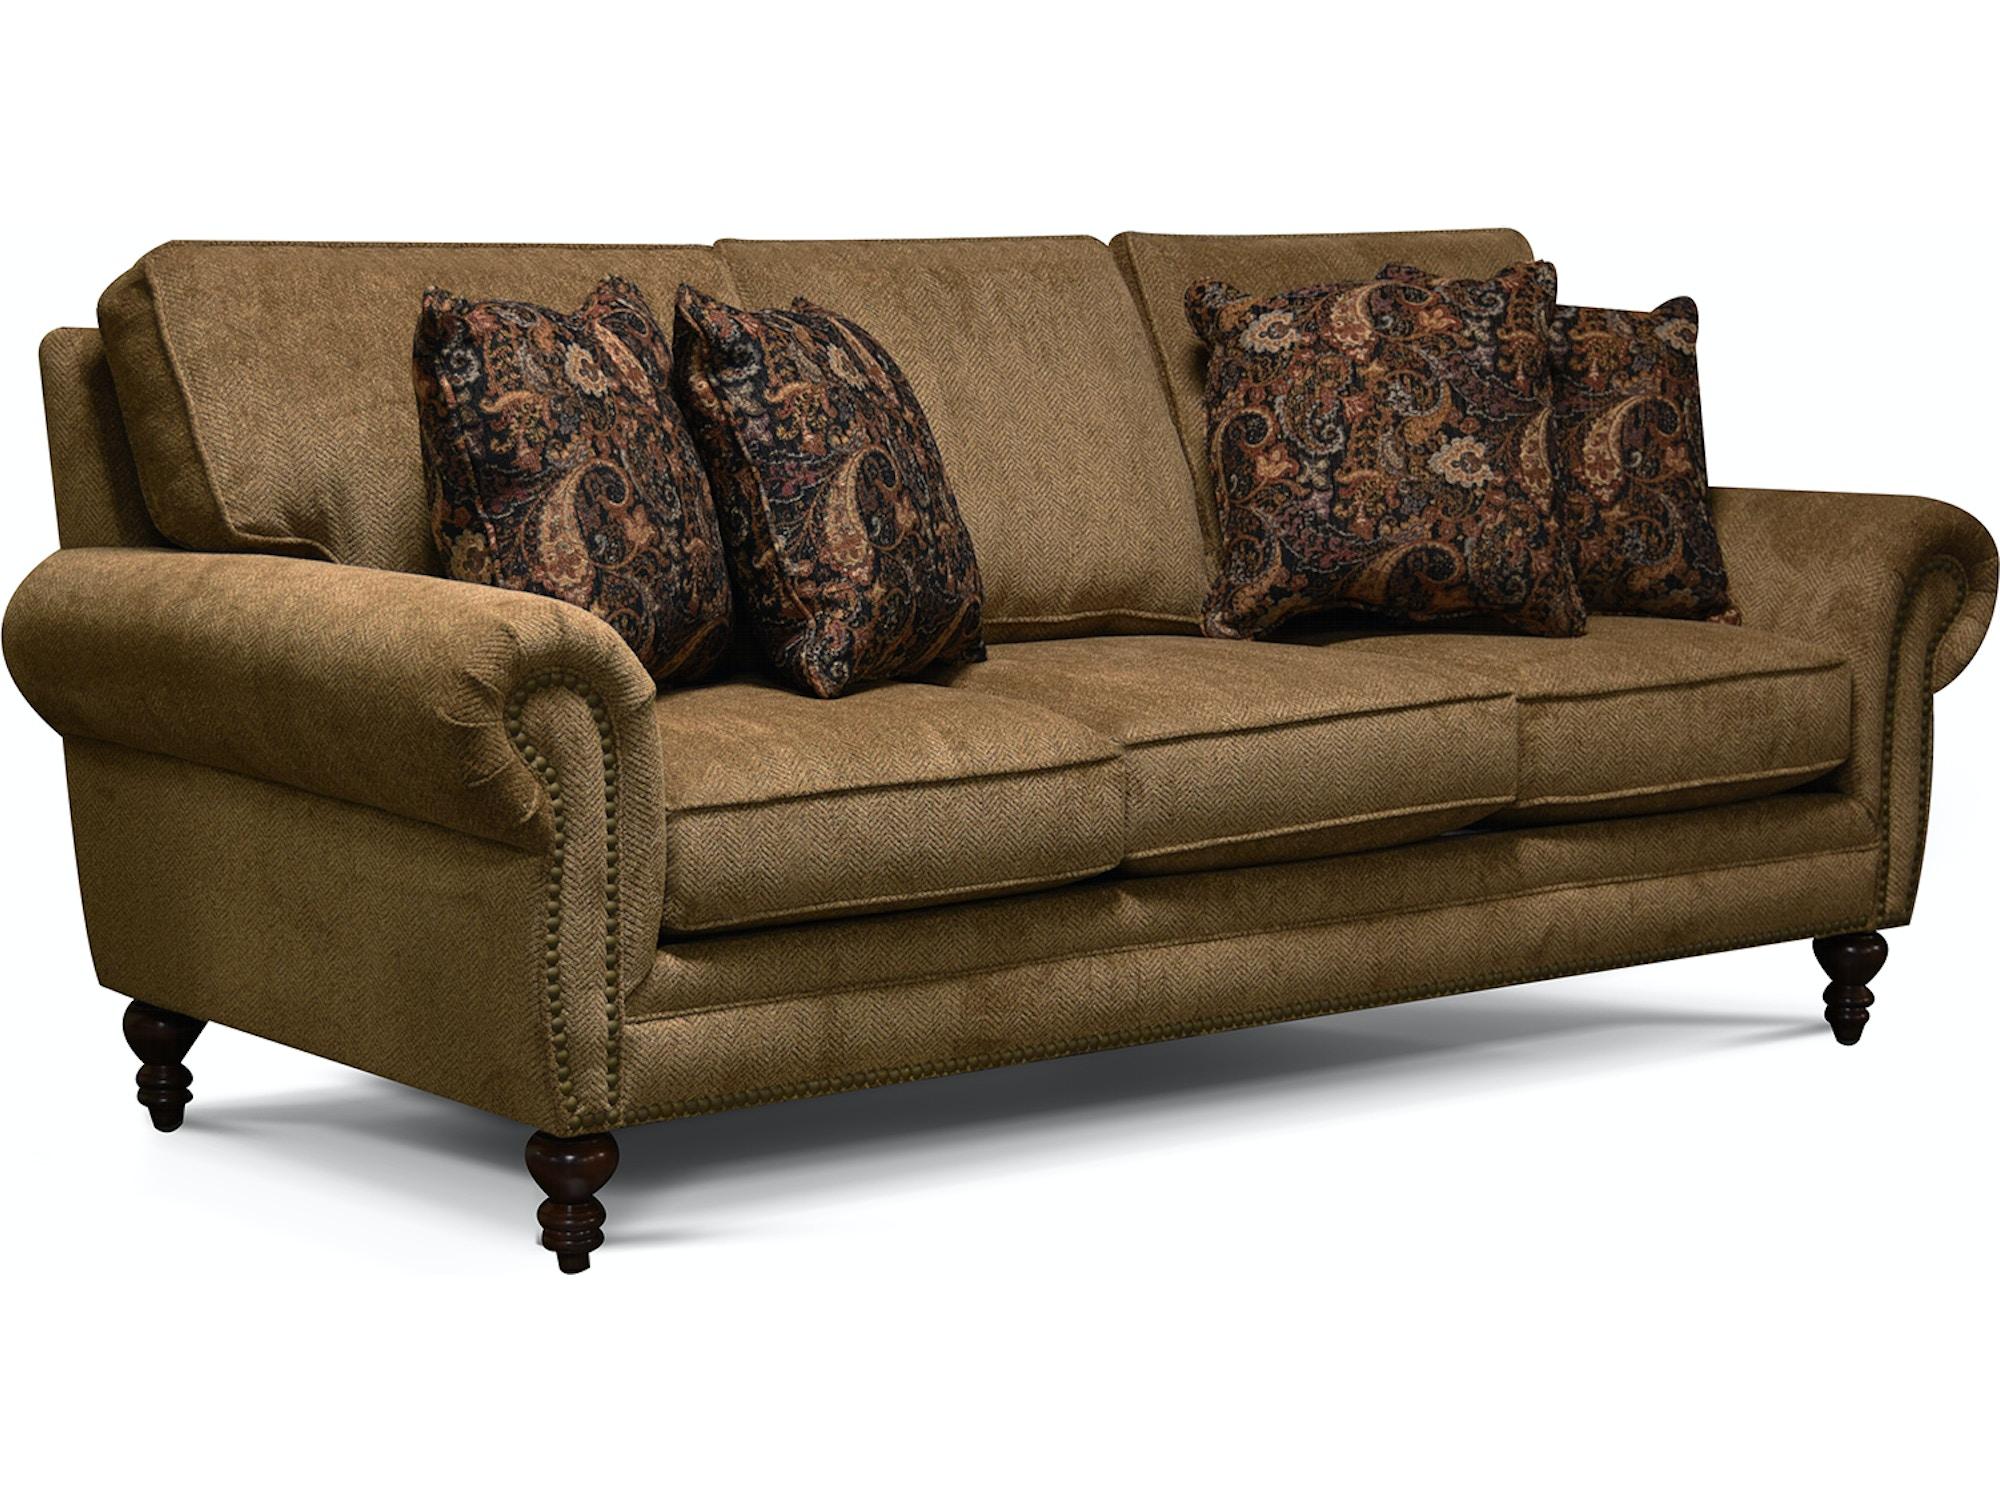 Sofa Sleeper Furniture Fair England Furniture Furniture Fair Cincinnati Dayton Oh And Leather